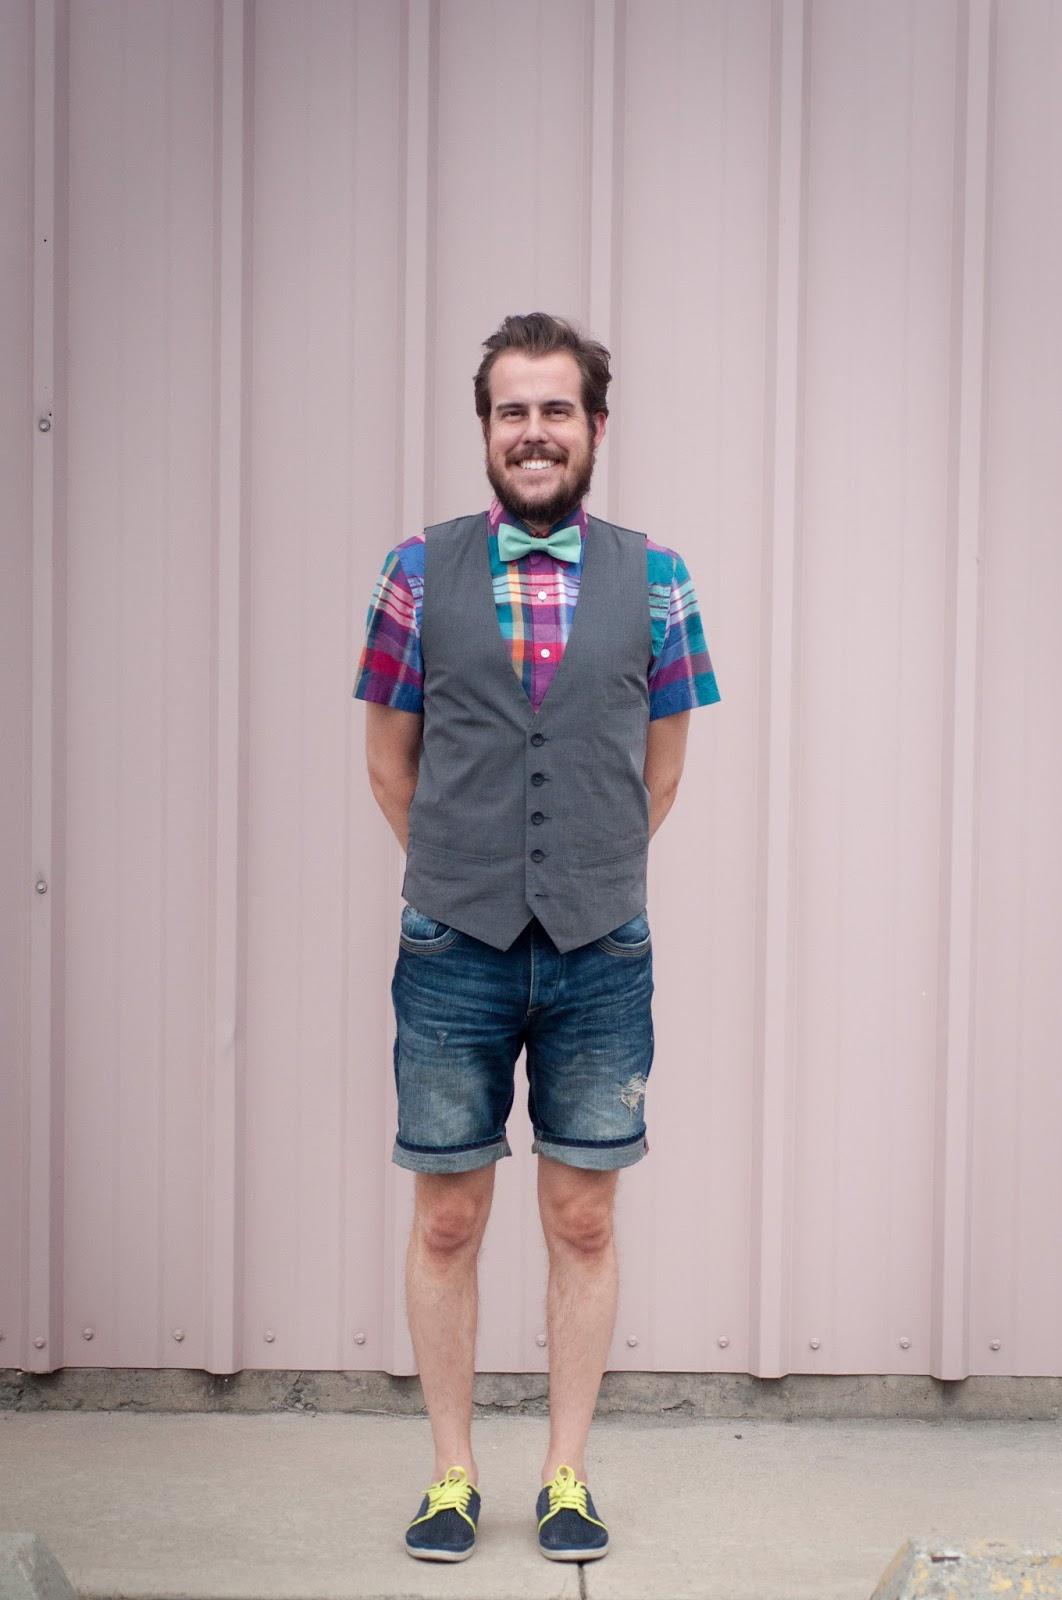 mens style, mens fashion, ootd, zara, vest, mens formal wear, mens wedding attire, jcrew ootd